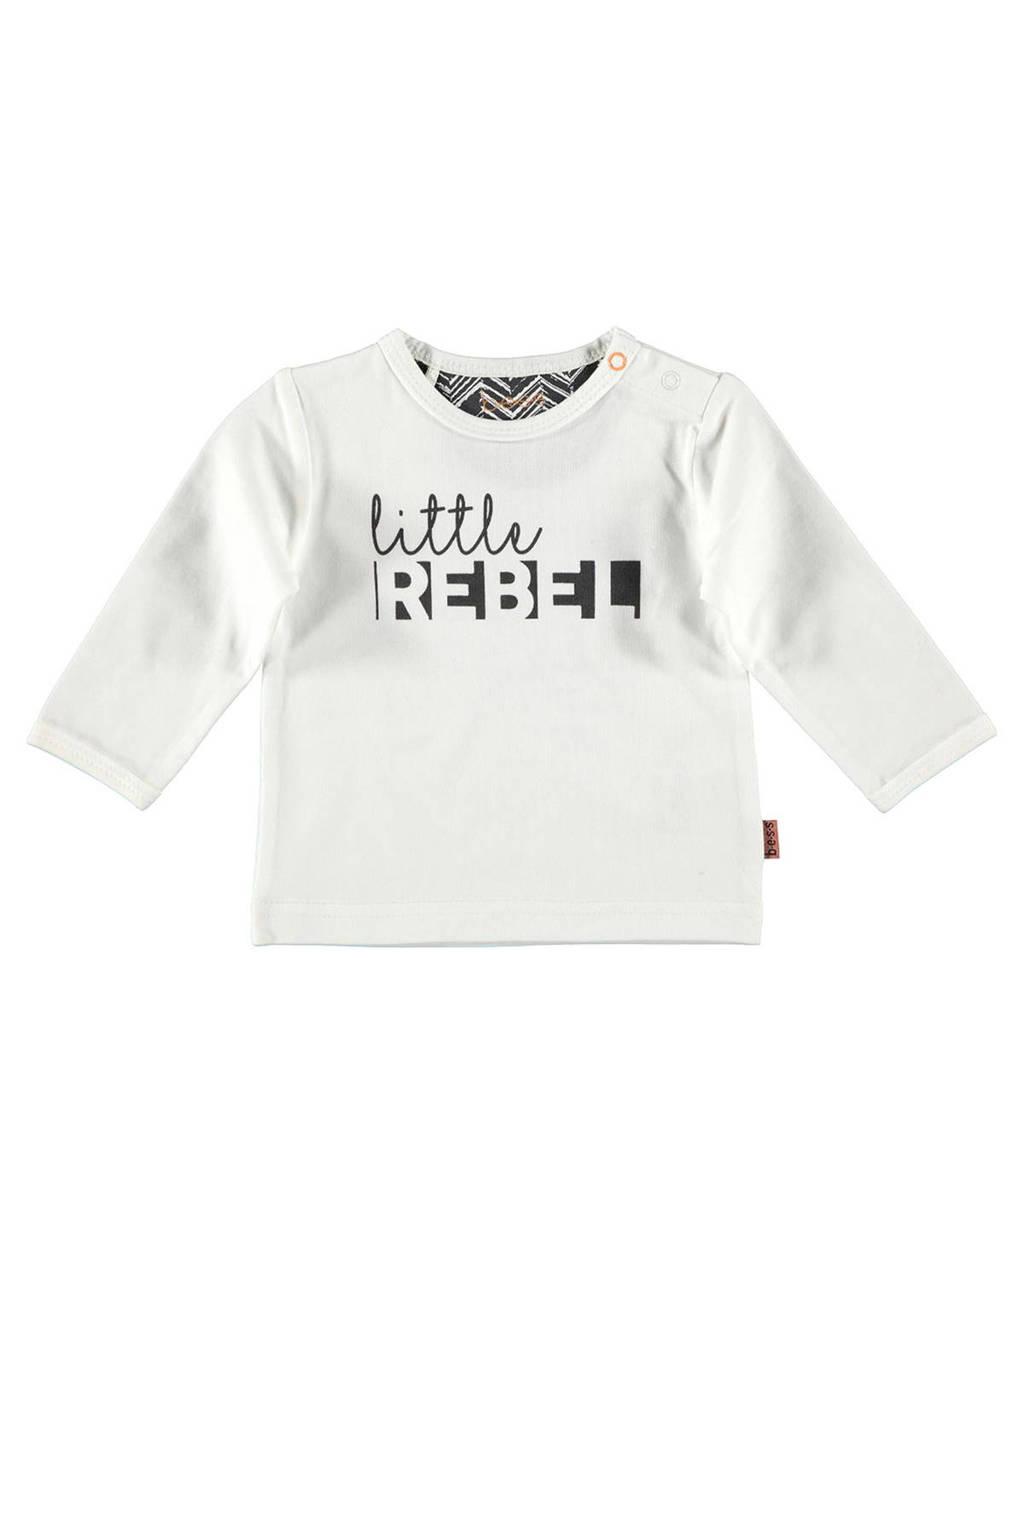 B.E.S.S baby longsleeve met printopdruk wit/zwart, Wit/zwart